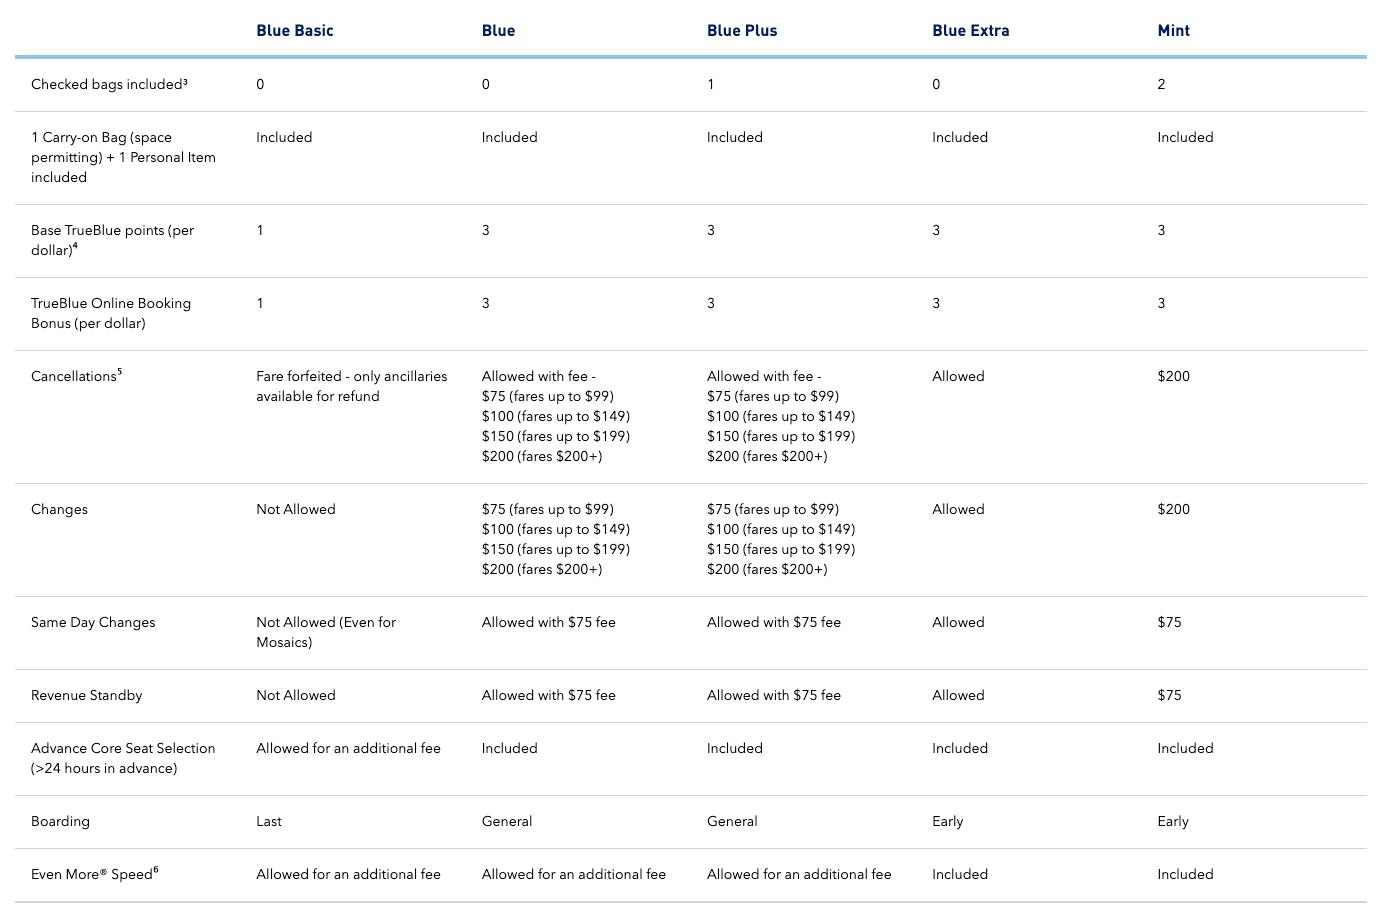 JetBlue Fares as of November 12 2019